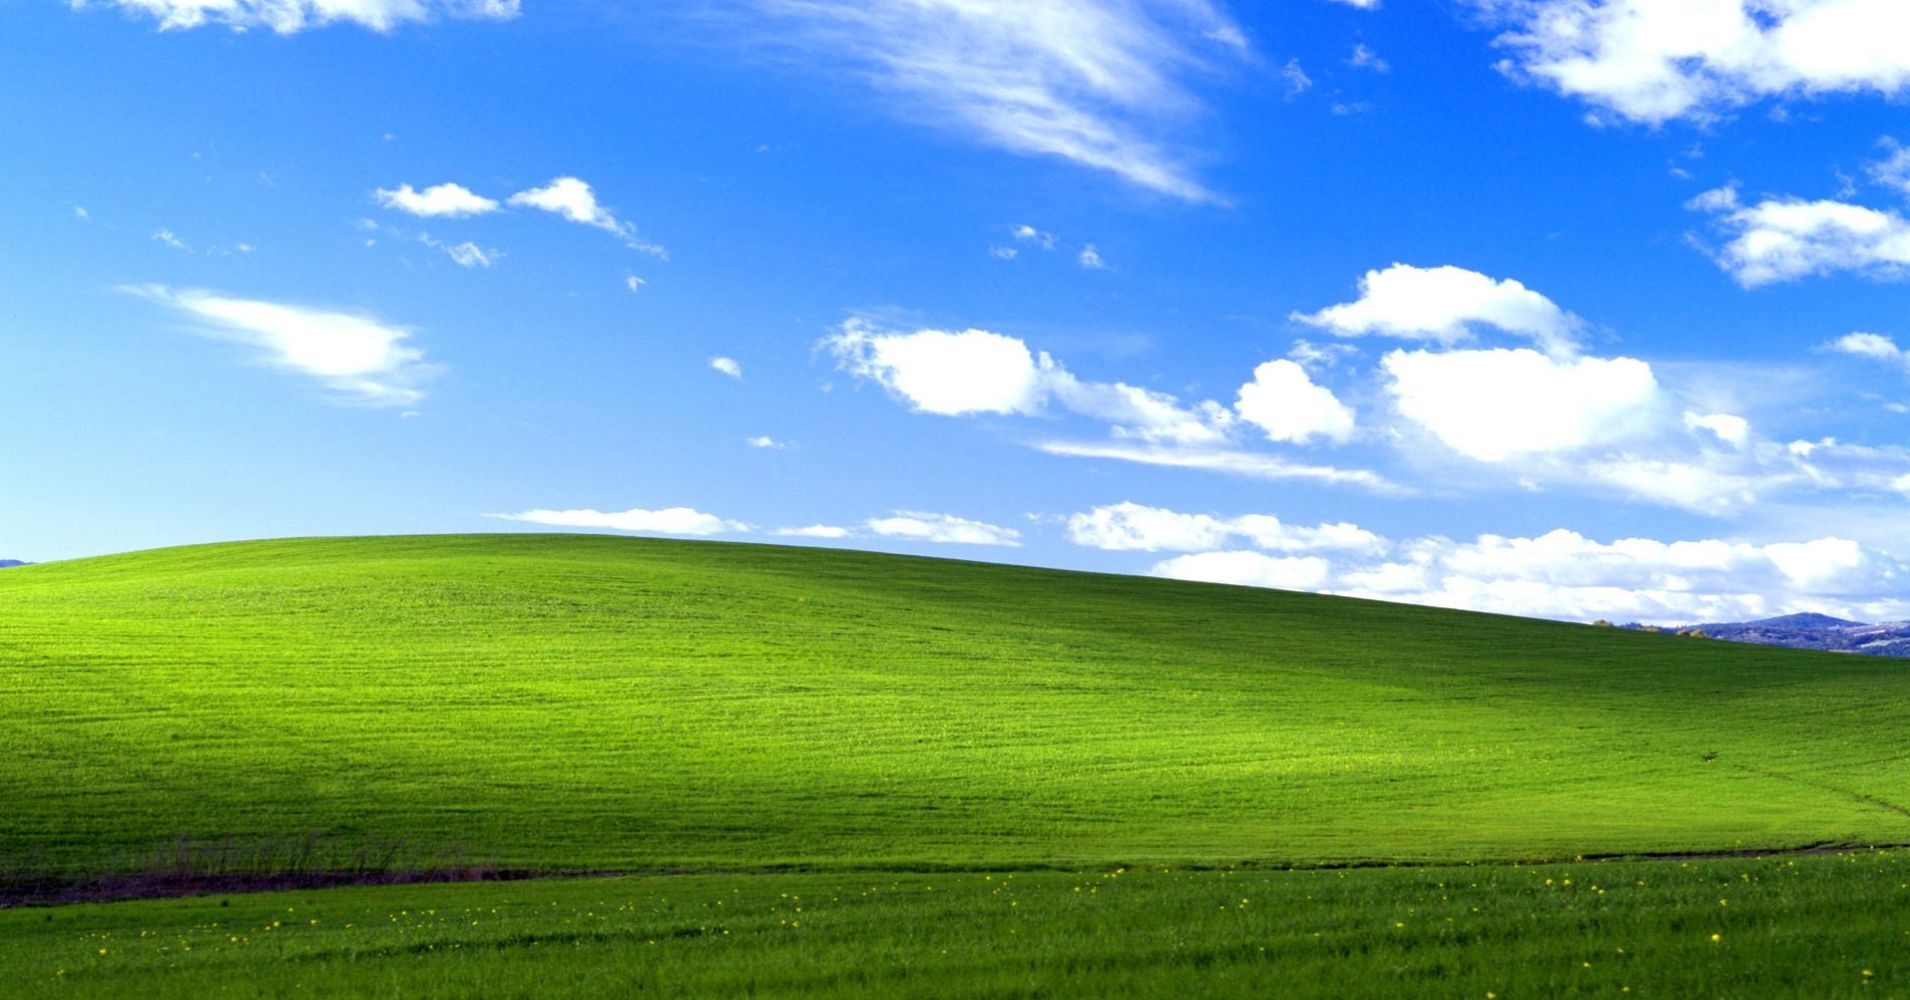 This Famous Desktop Wallpaper Is Actually A Real Untouched Photo Windows Wallpaper Windows Xp Backgrounds Desktop